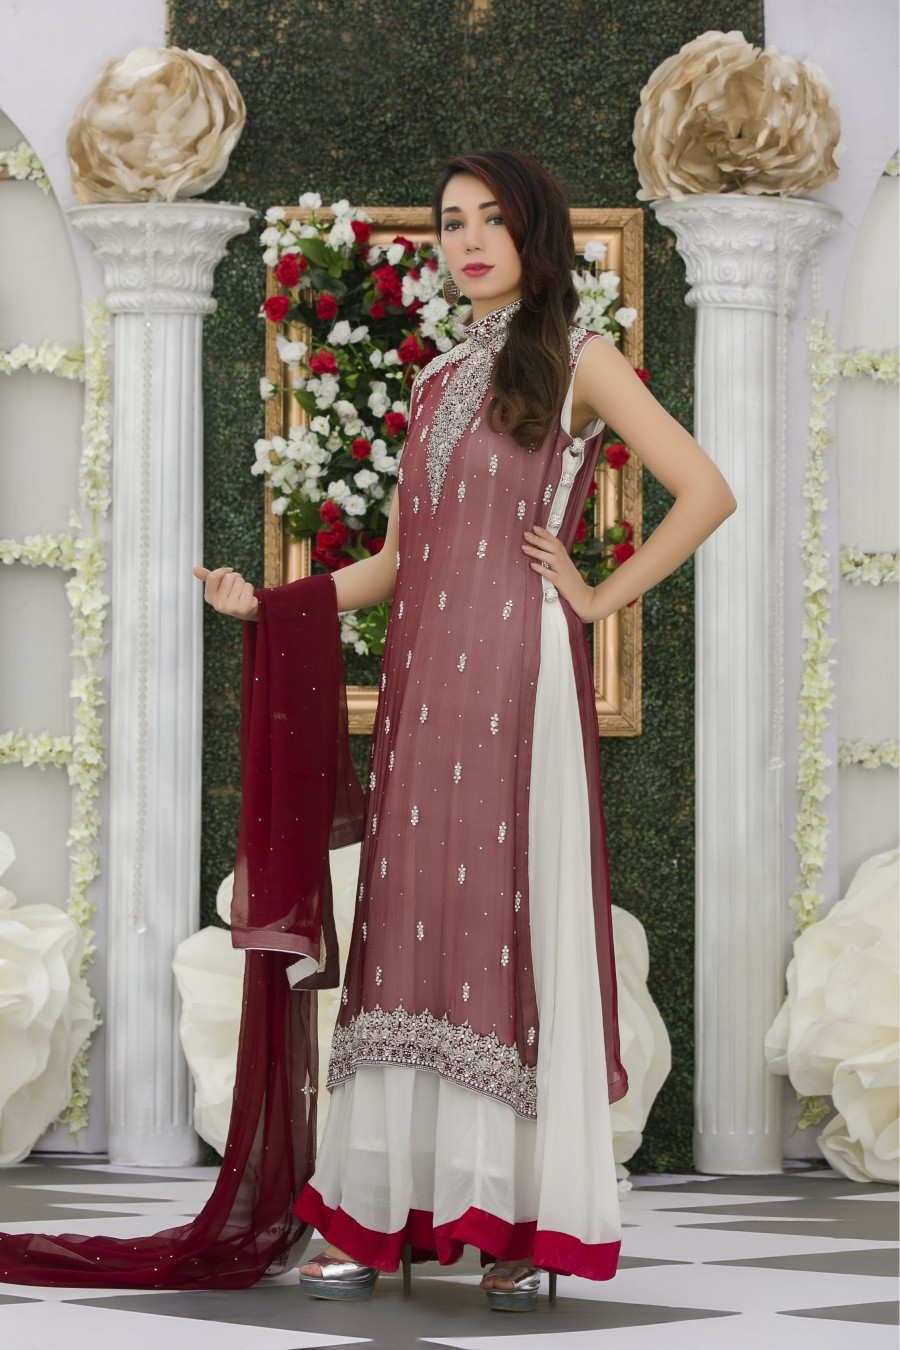 Maroon color wedding dresses